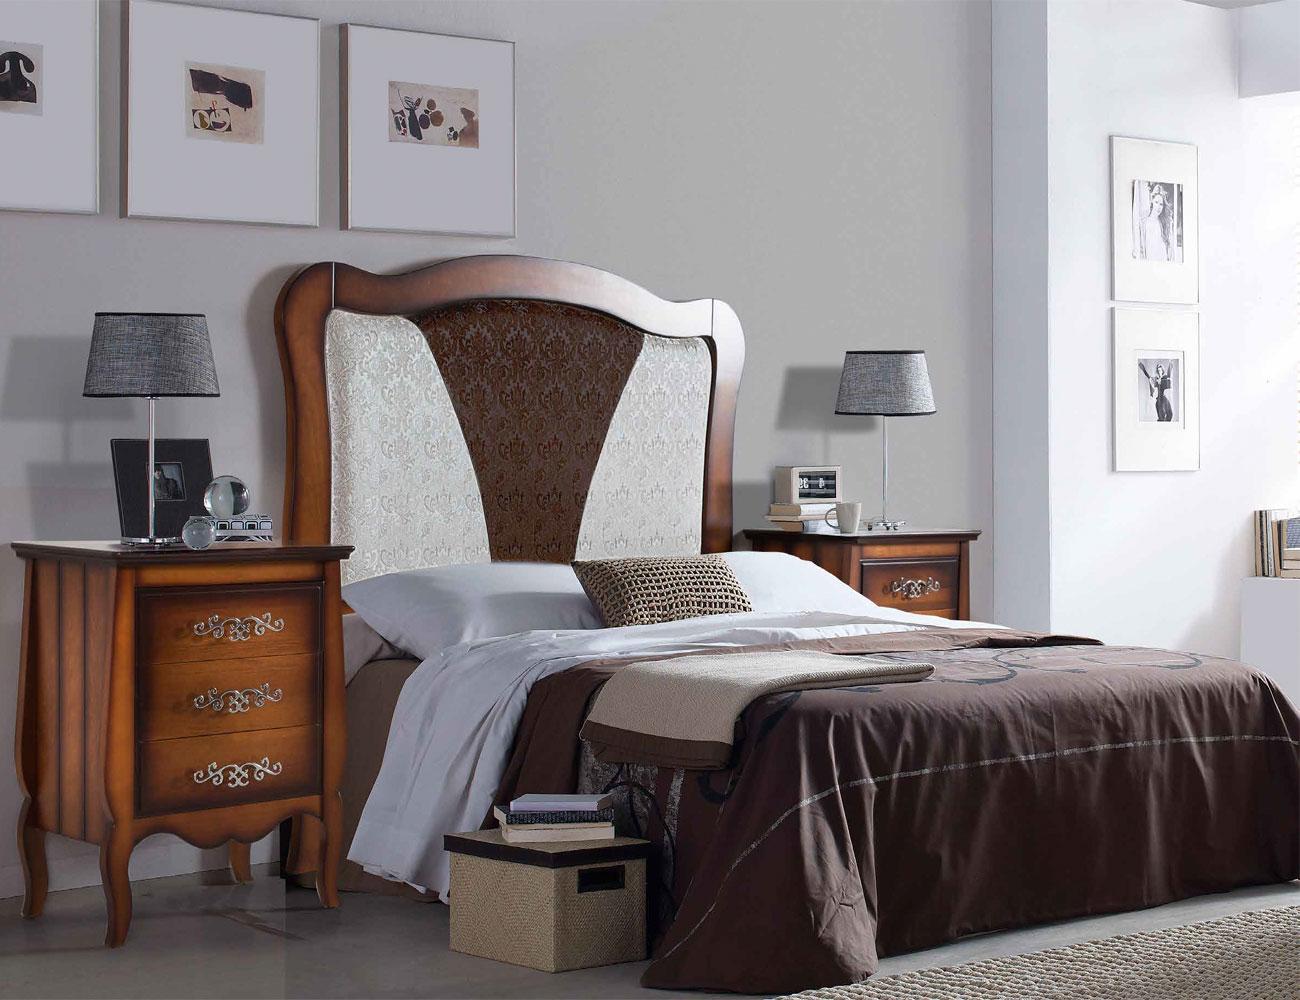 Composicion07 dormitorio matrimonio comoda